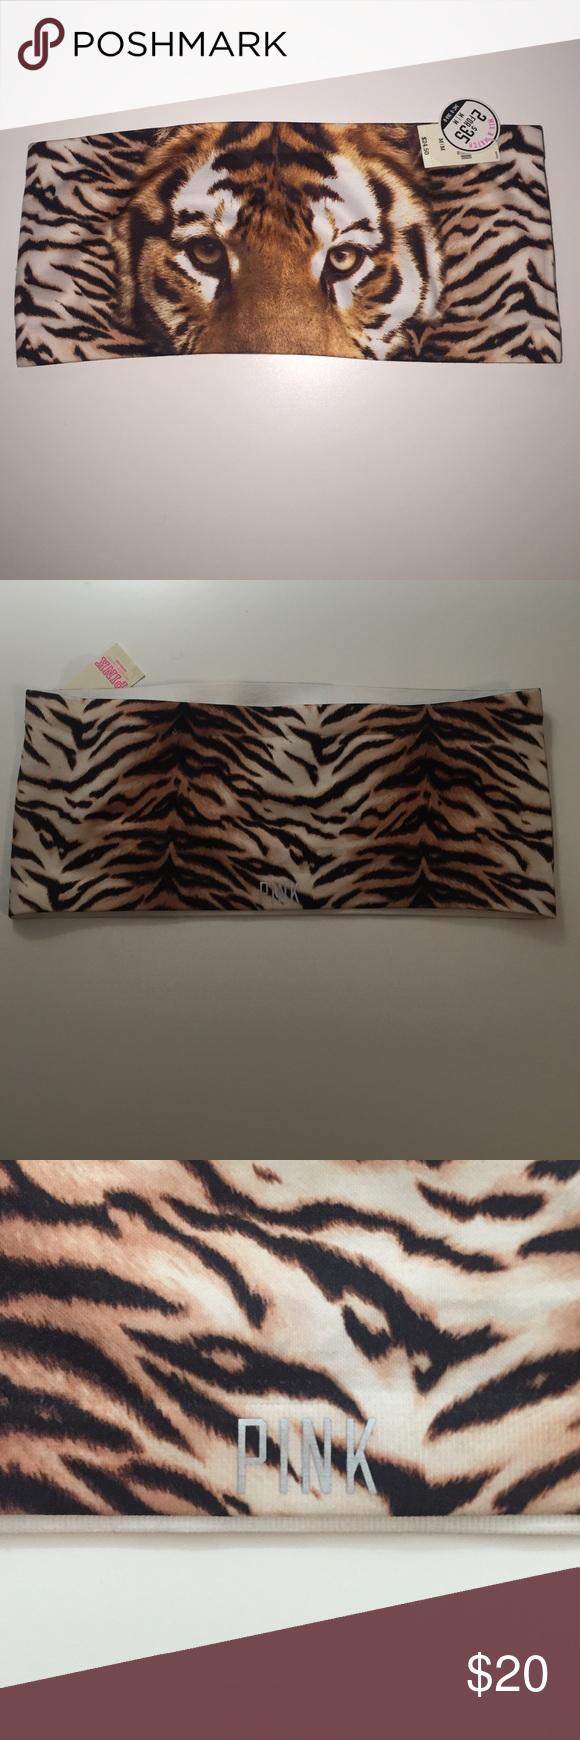 VS PINK tiger bandeau top - NWT - medium Tiger print bandeau top - NWT PINK Victoria's Secret Intimates & Sleepwear Bandeaus